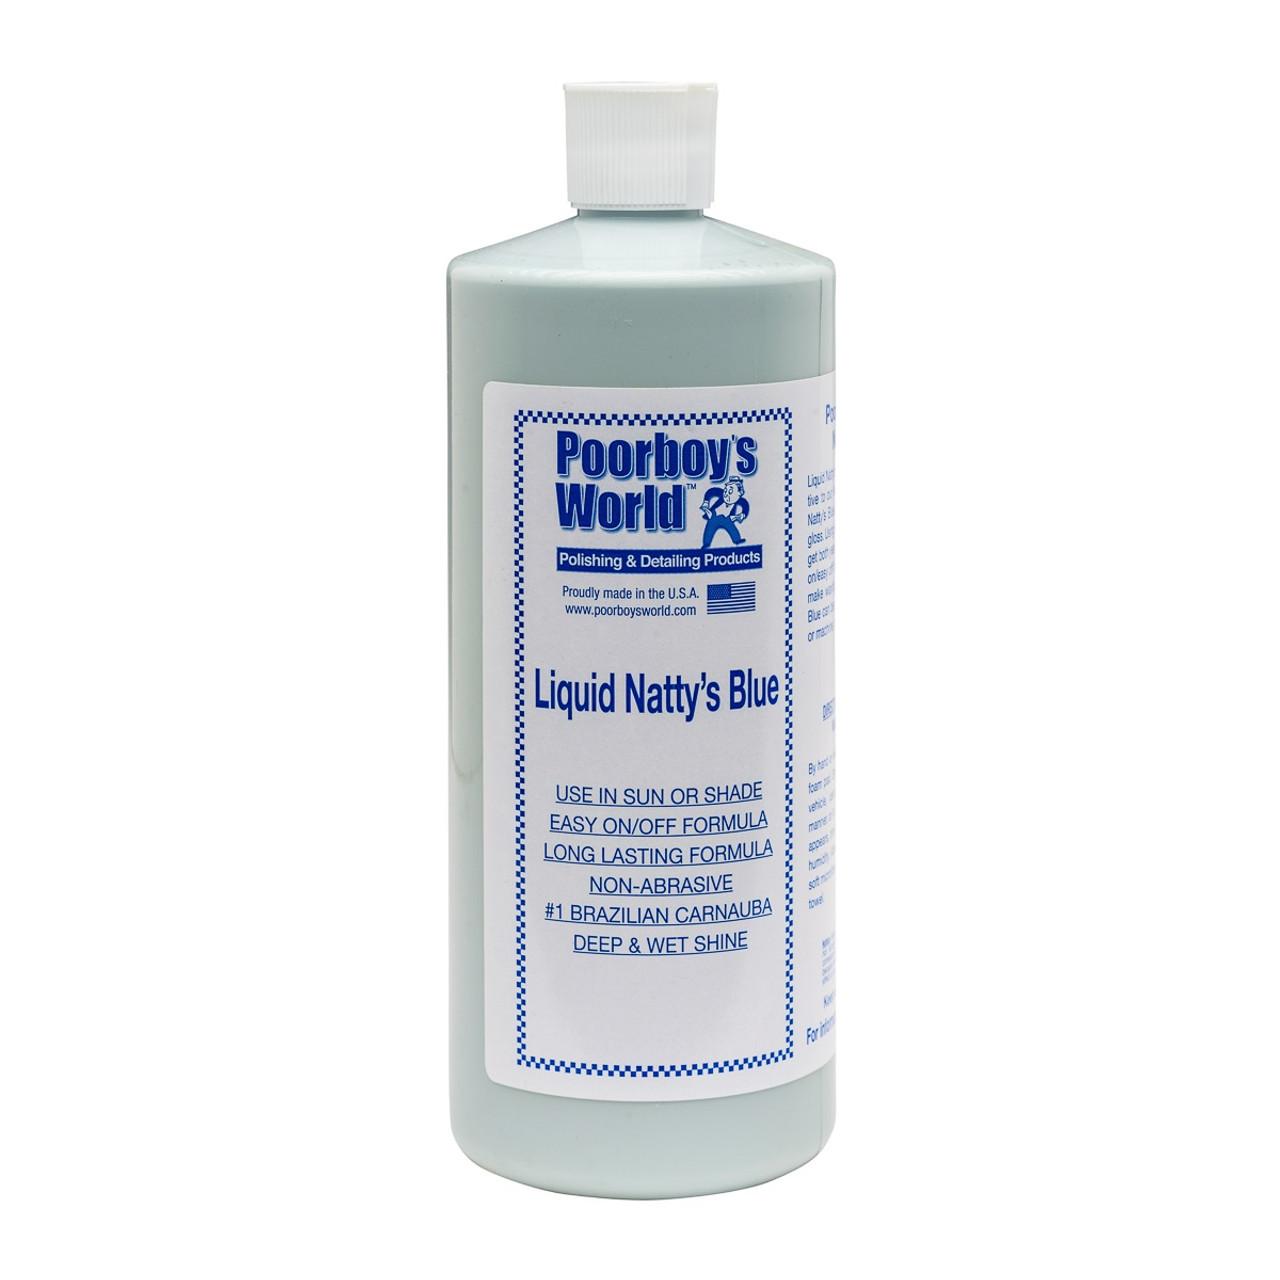 Poorboy's World Liquid Natty's Blue 32oz